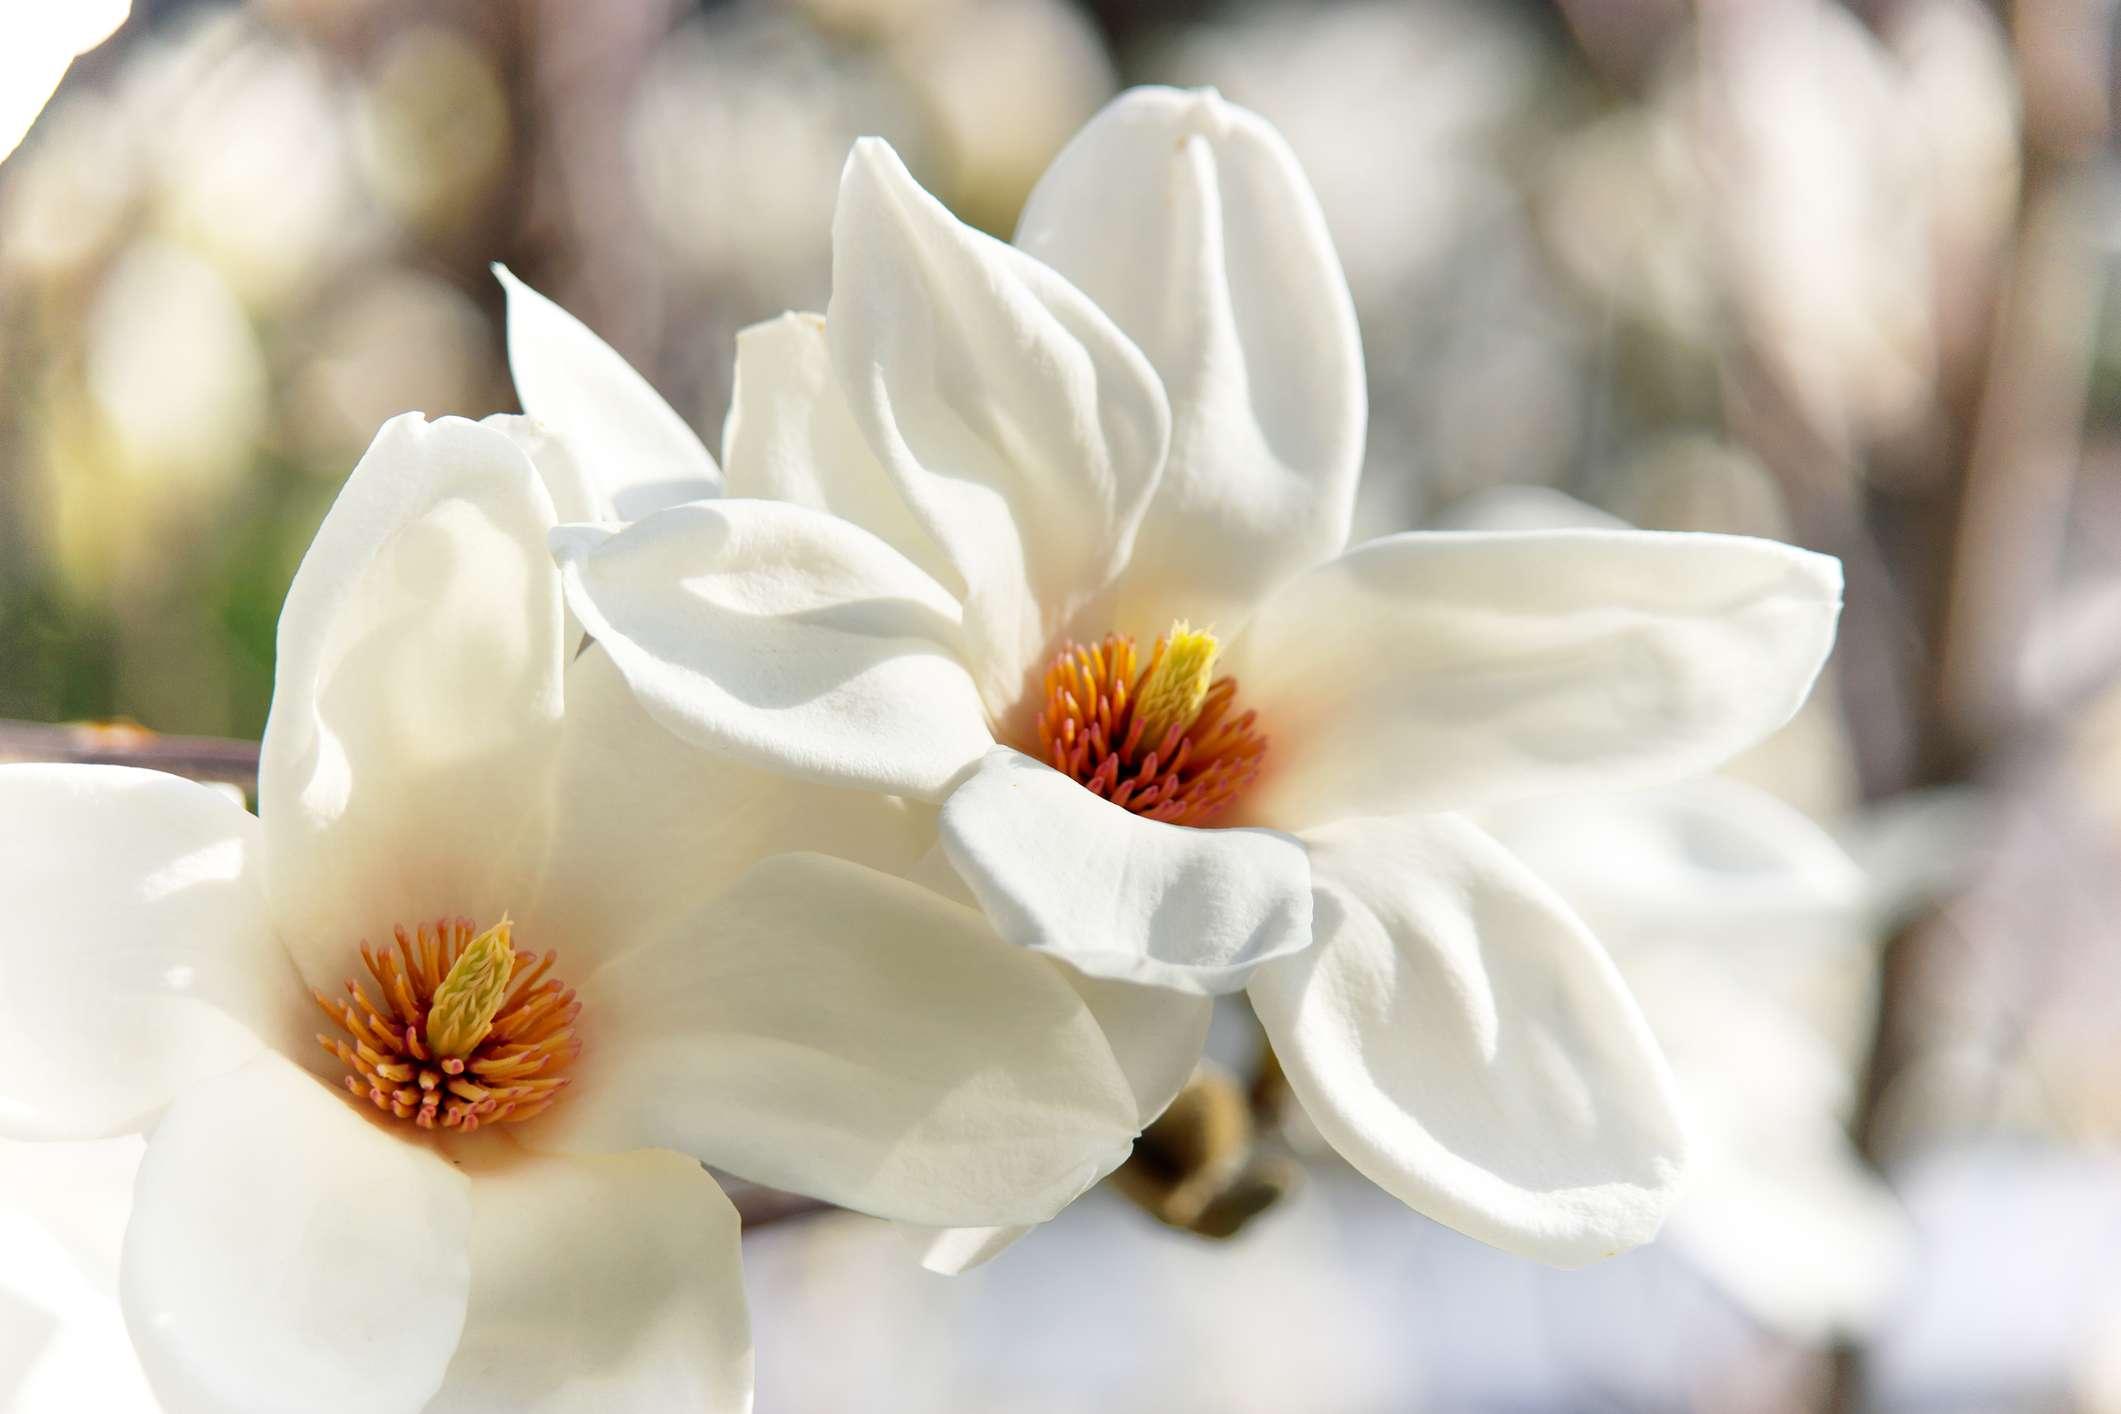 closeup showing reddish-orange seeds of the kobus magnolia